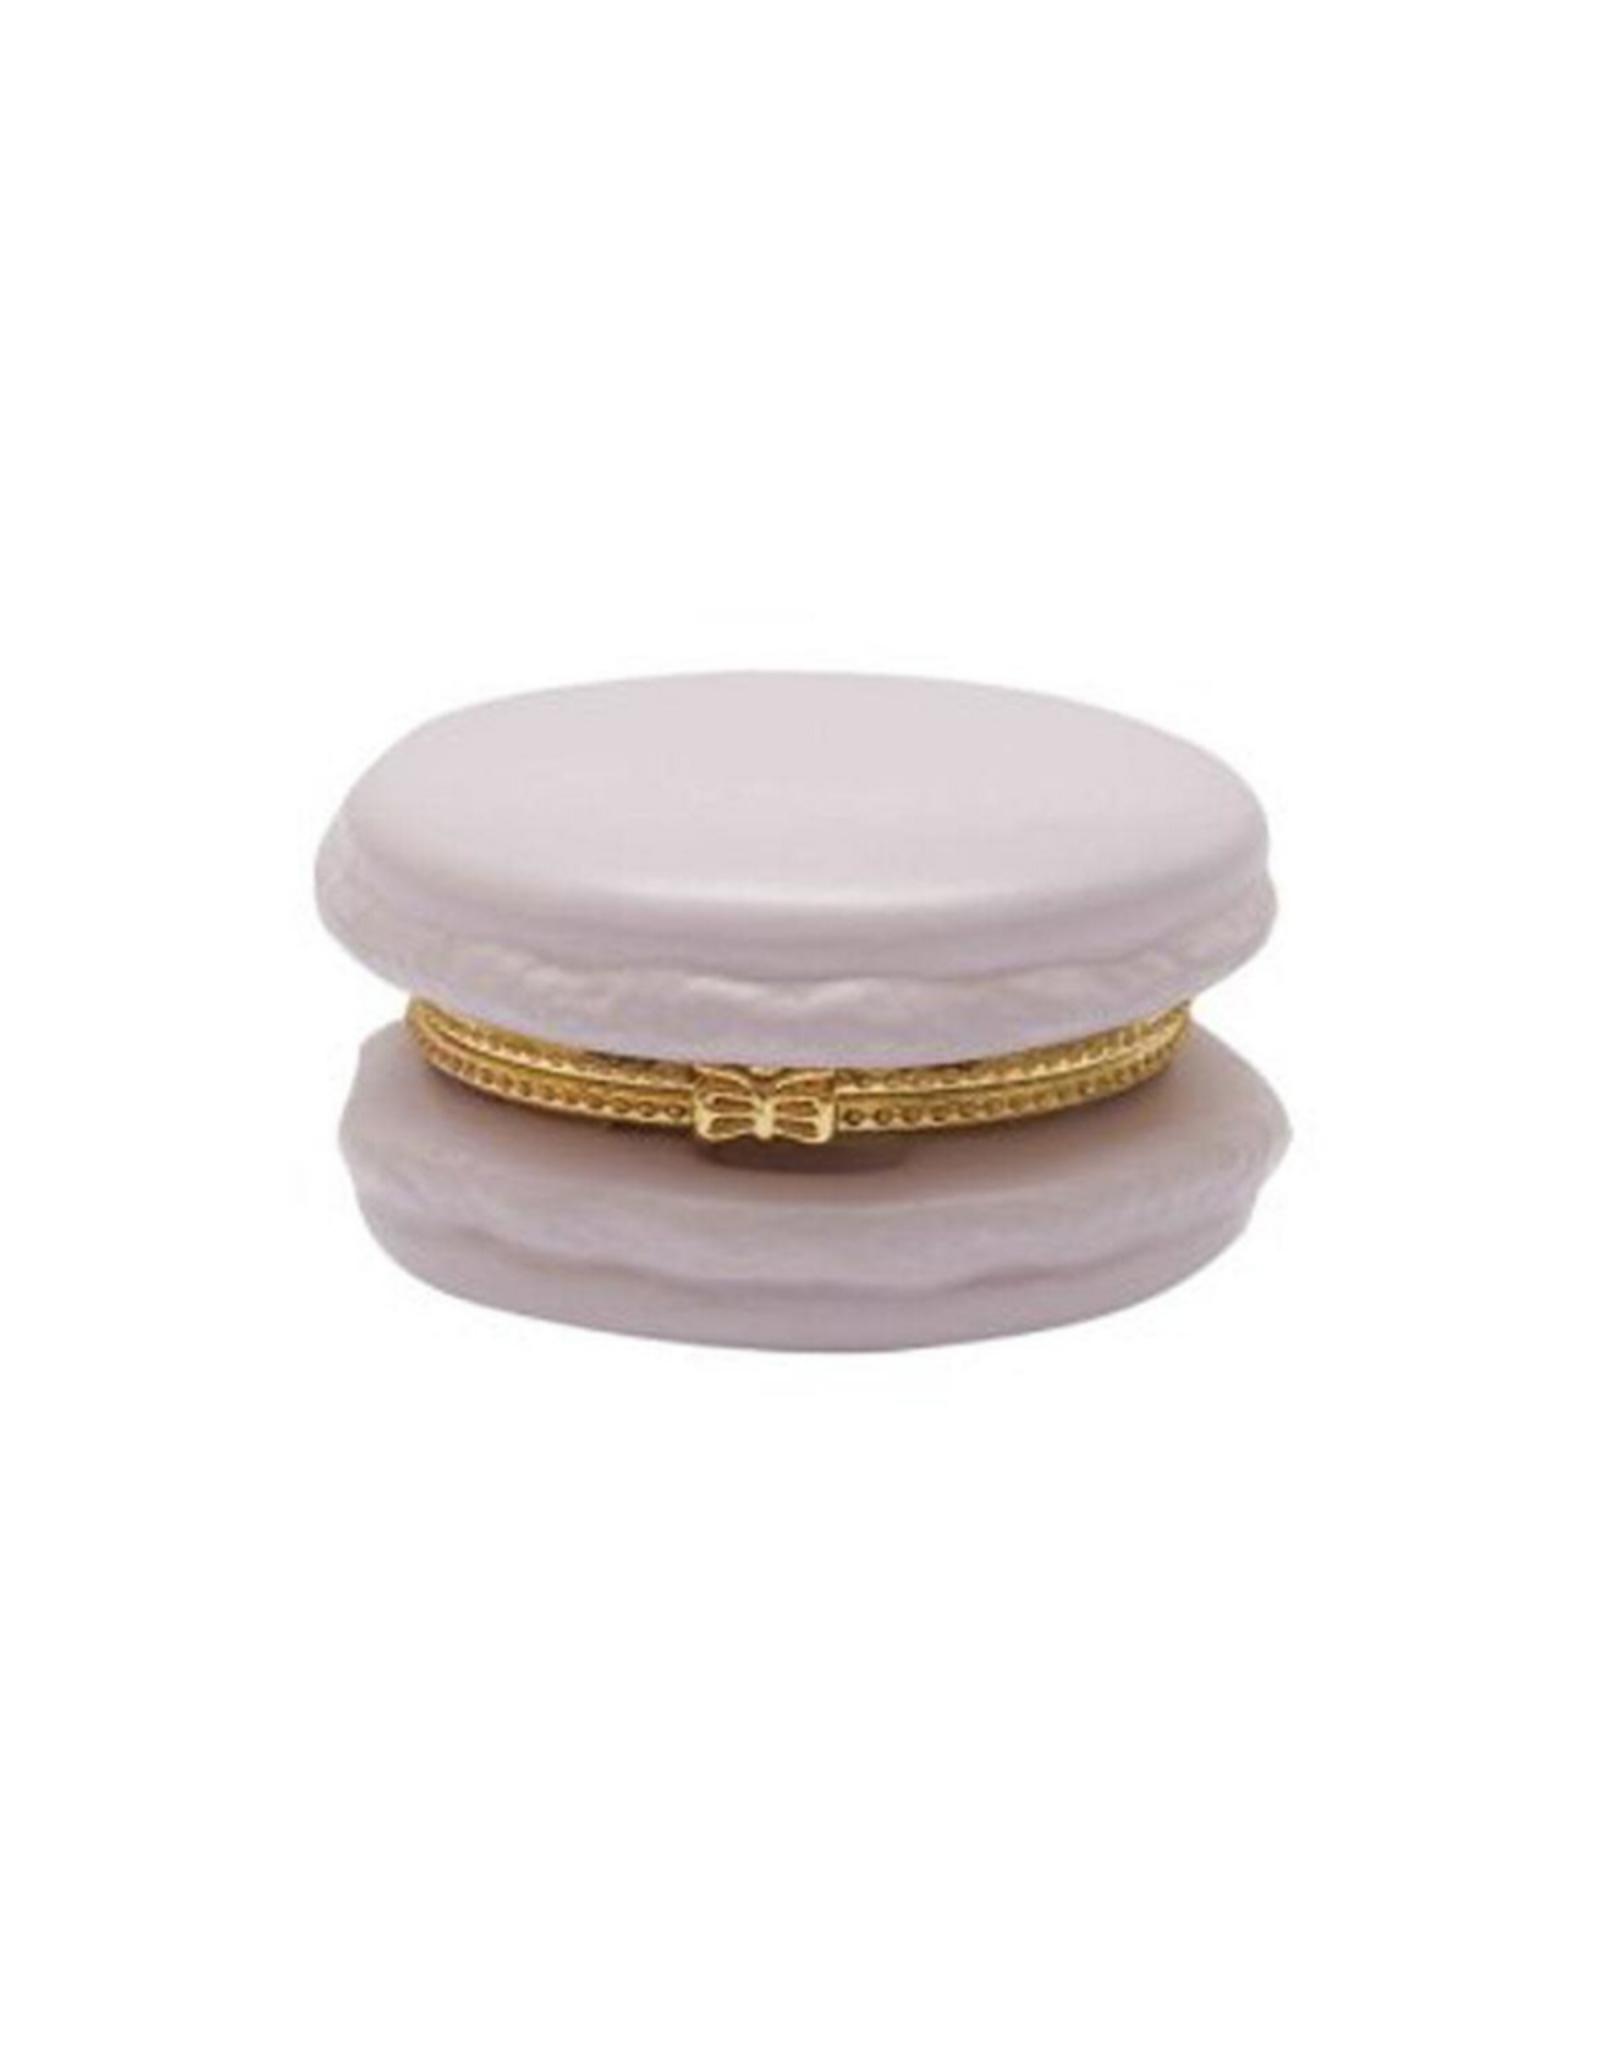 Two's Company Macaron Trinket Box